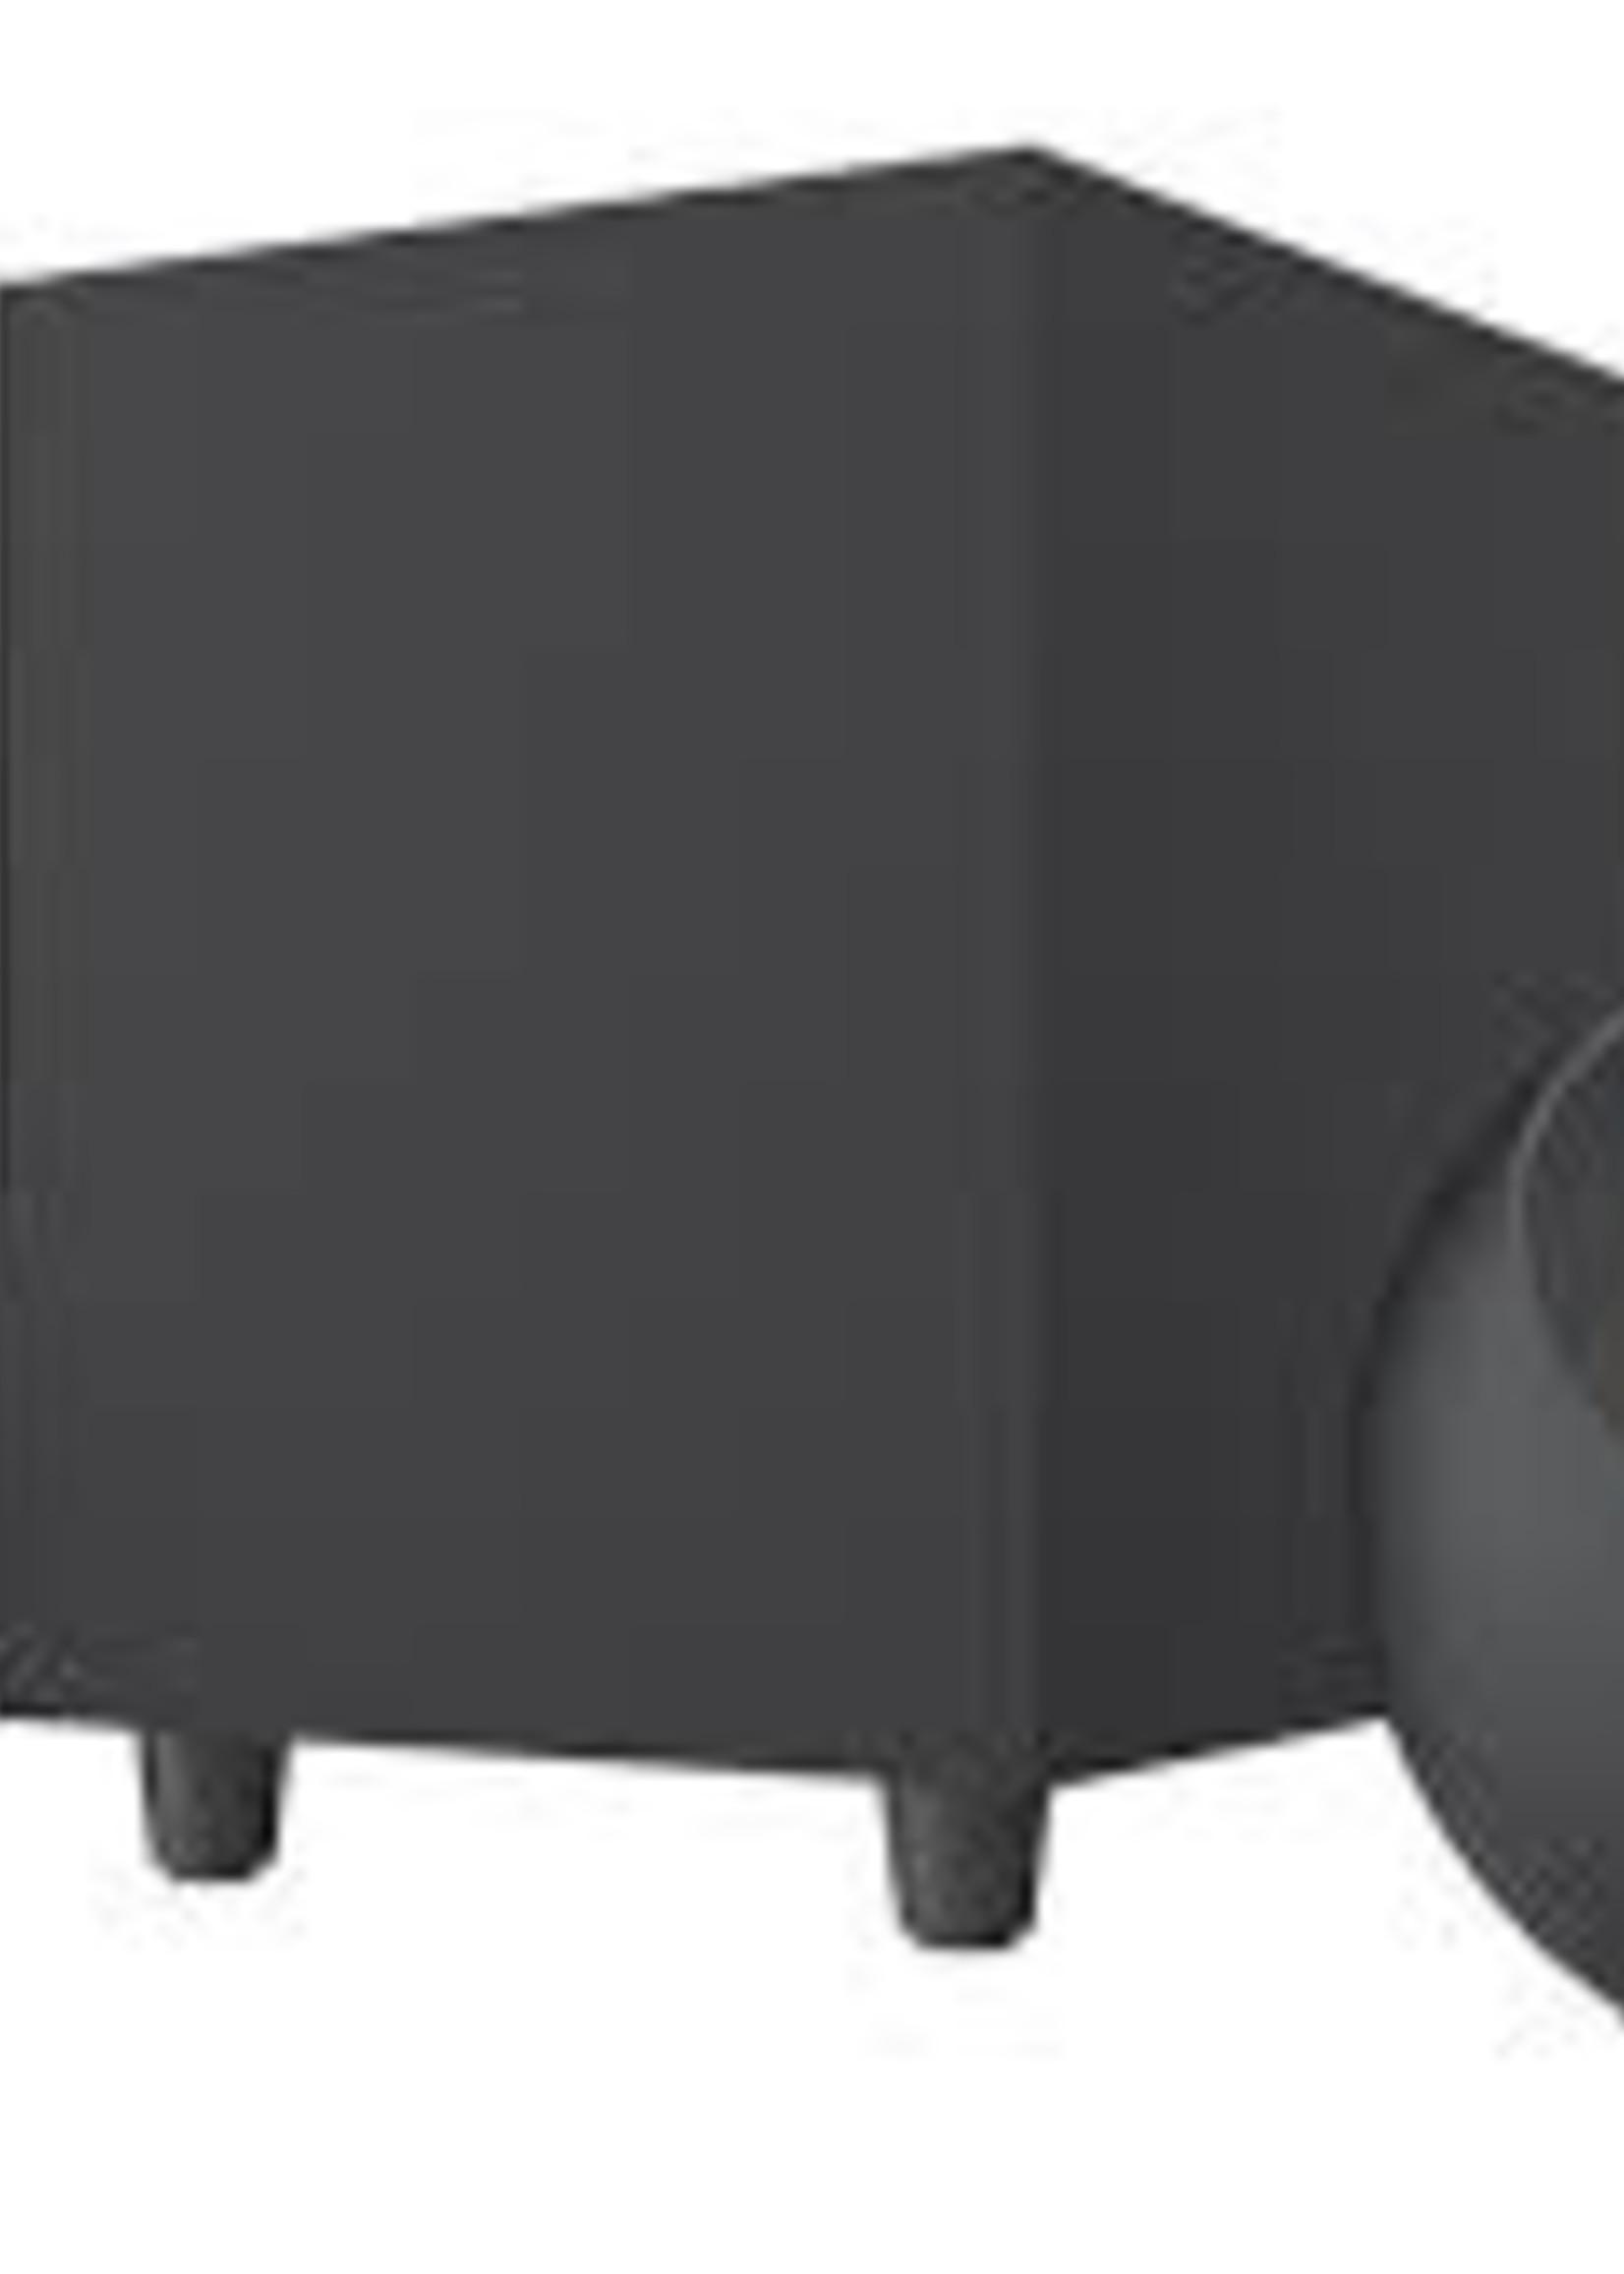 Creative Labs Creative Pebble Plus 2.1 Speaker System